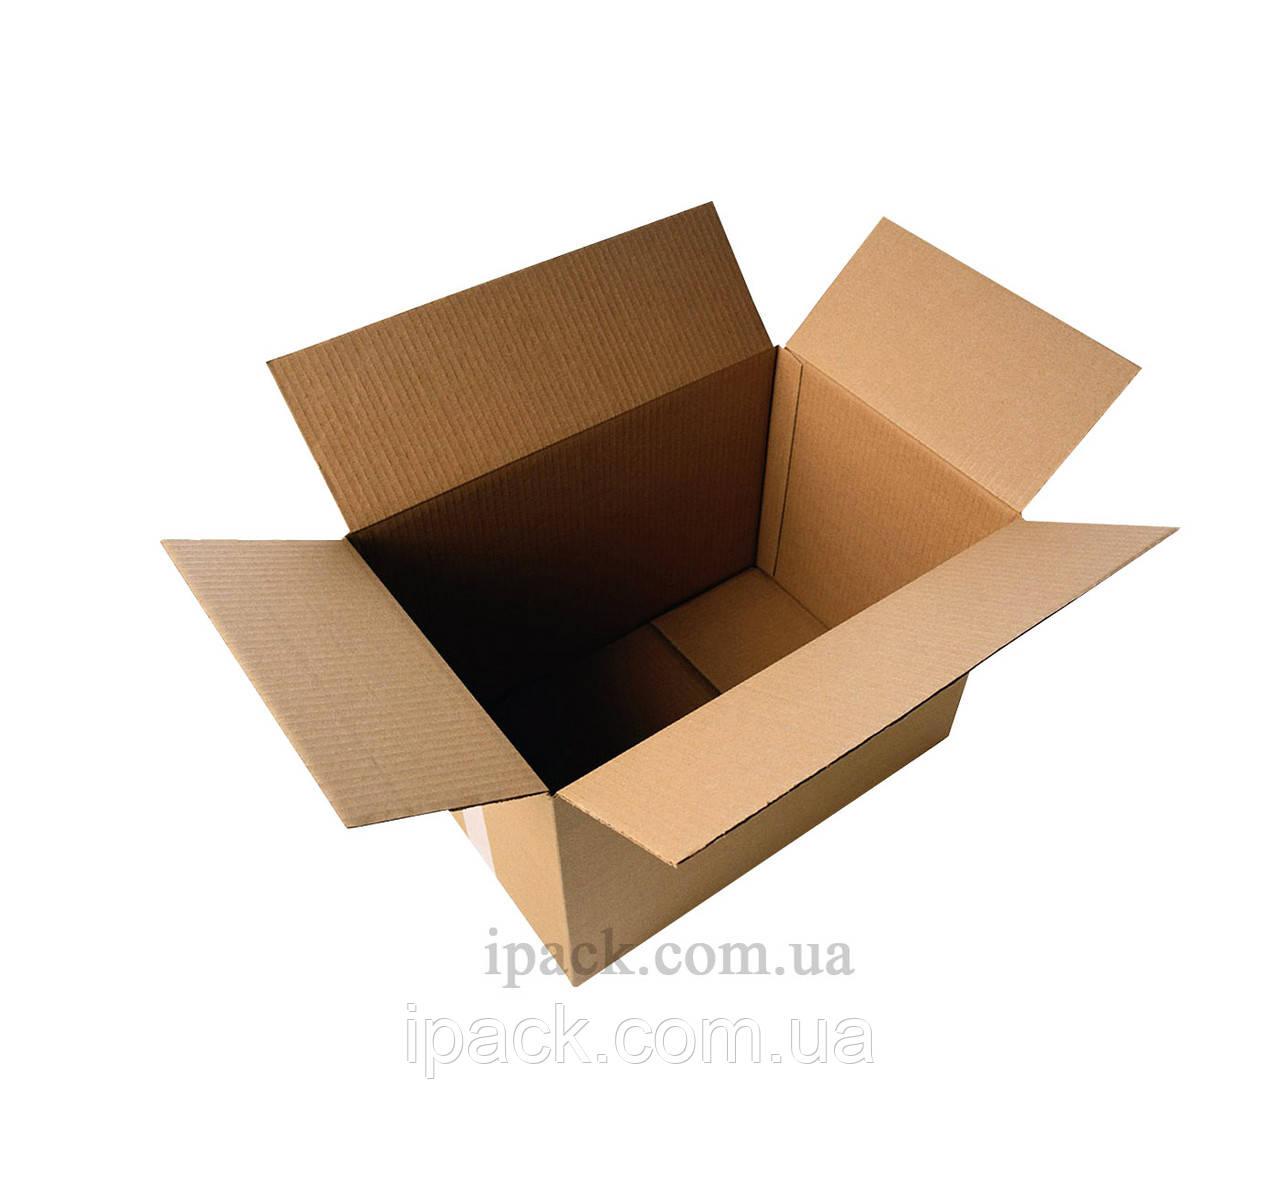 Гофроящик 300*145*305 мм, бурый, четырехклапанный картонный короб